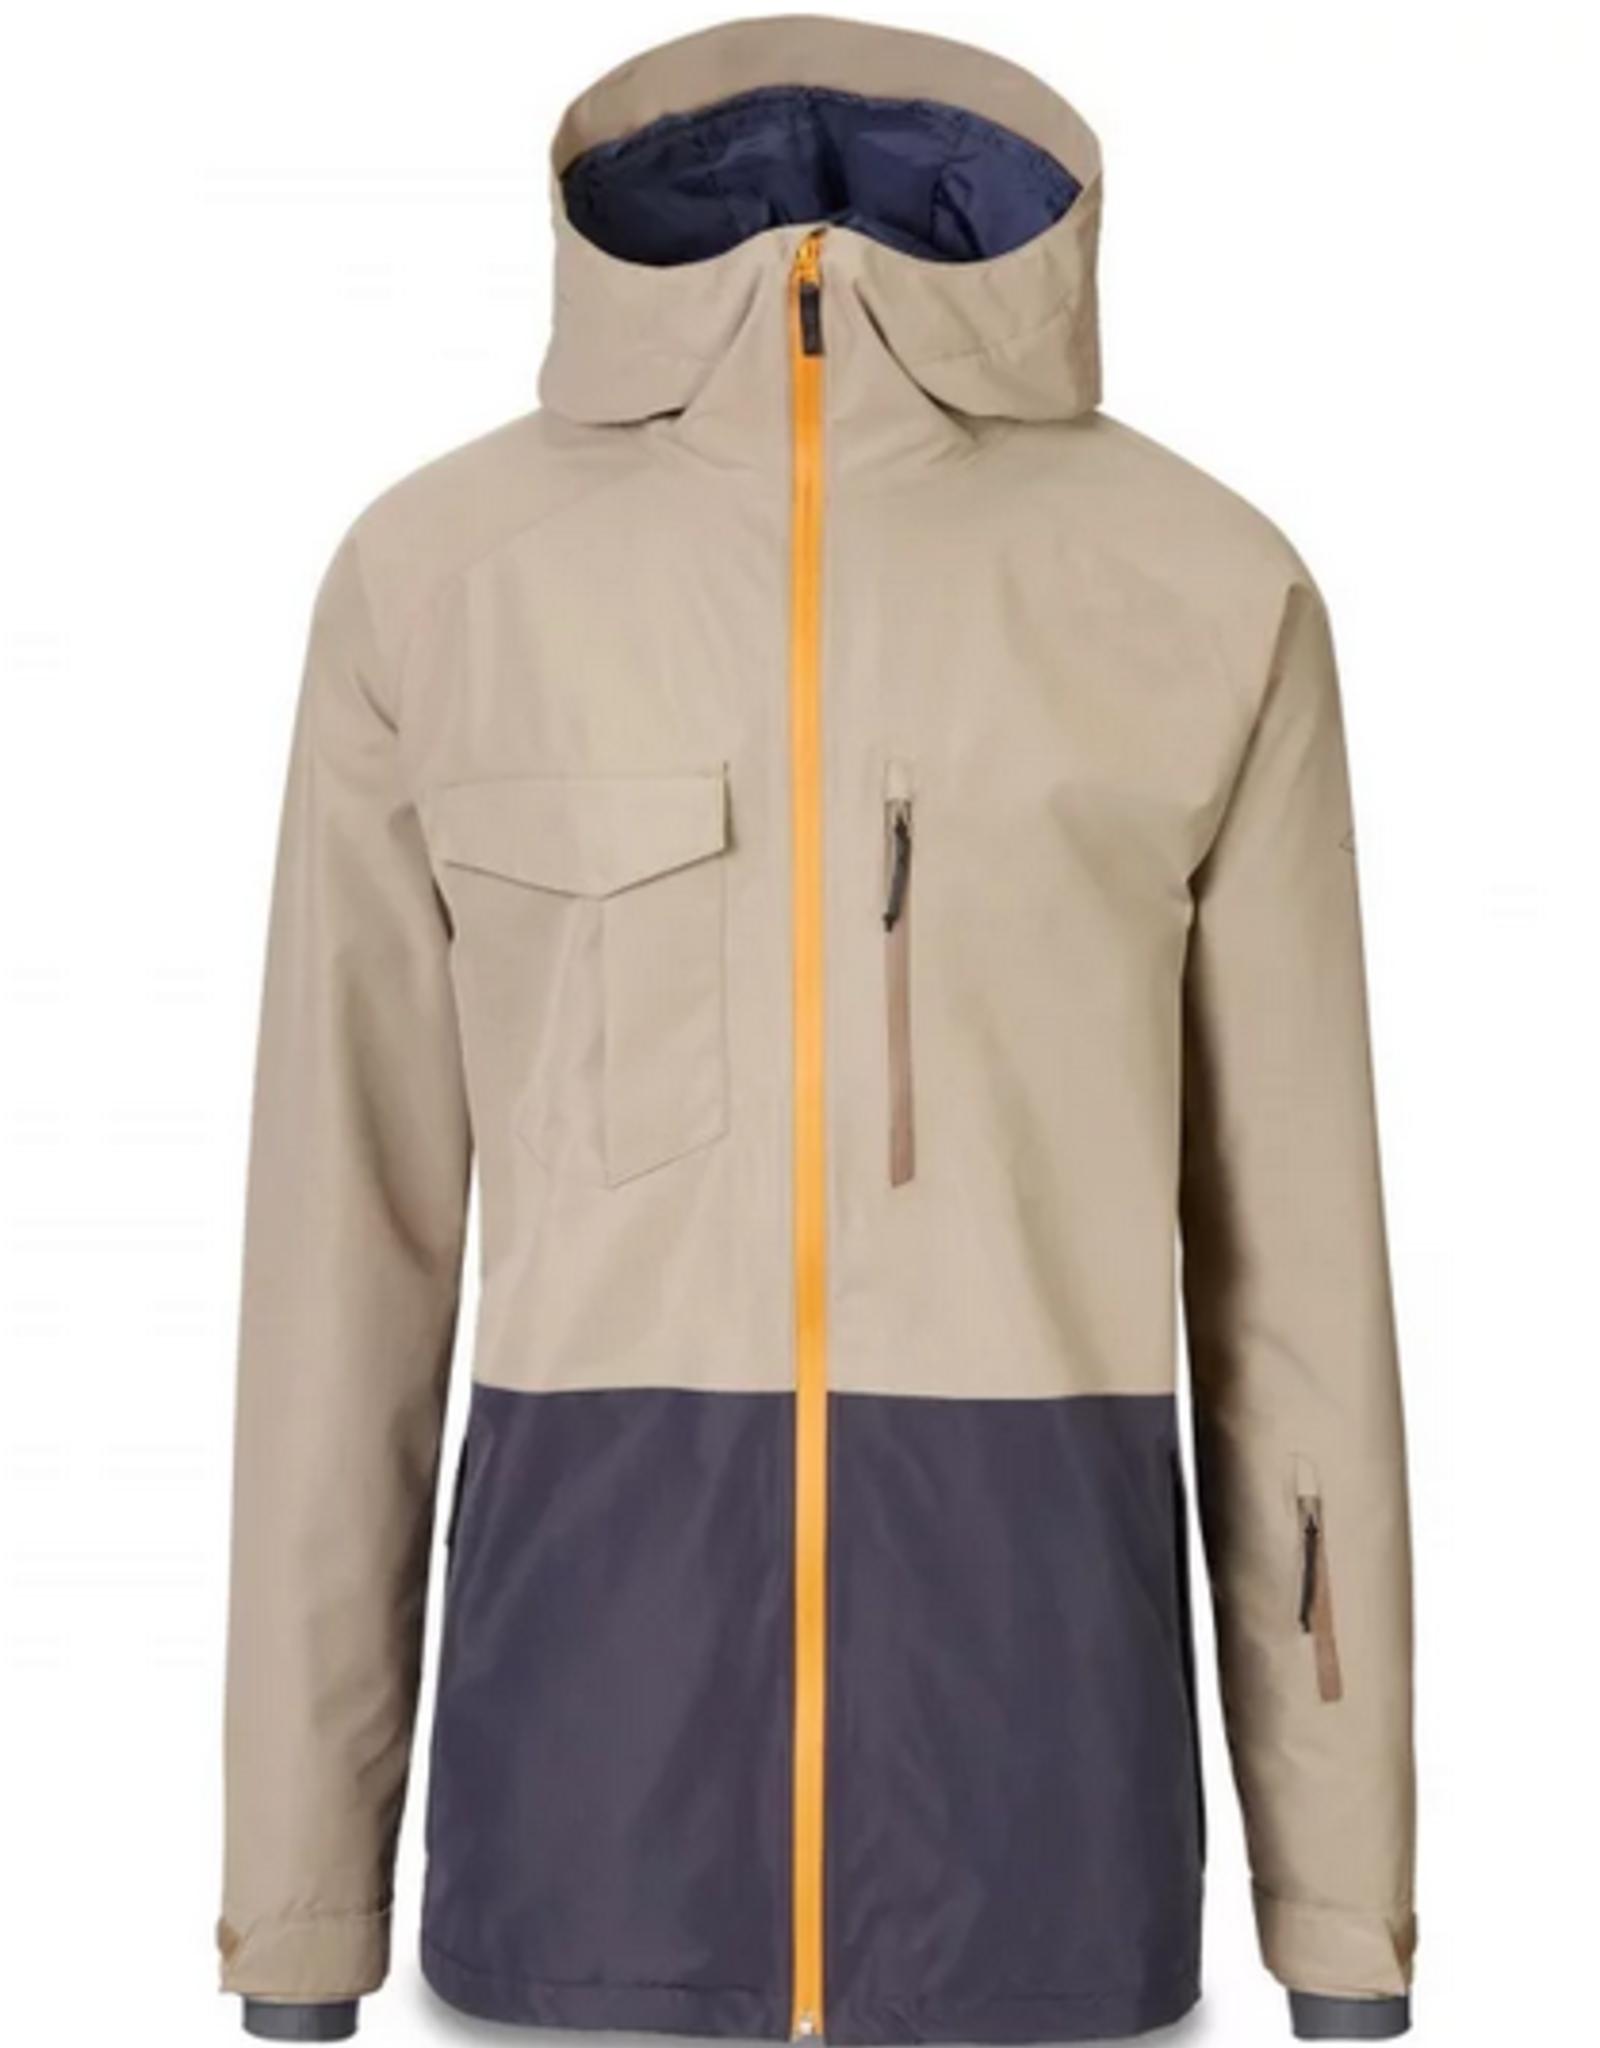 Dakine Smyth Pure Gore-tex 2L Jacket